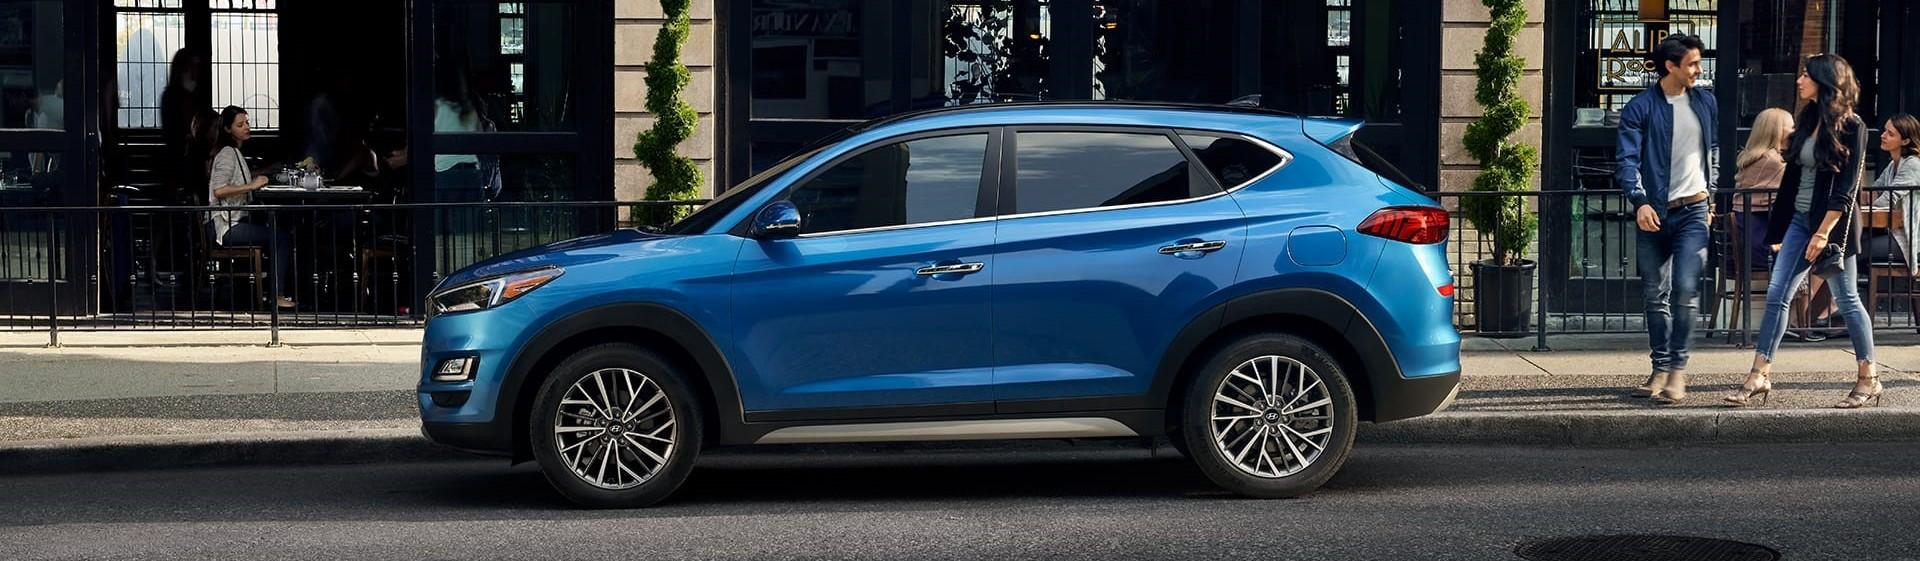 2020 Hyundai Palisade Leasing near Manassas, VA